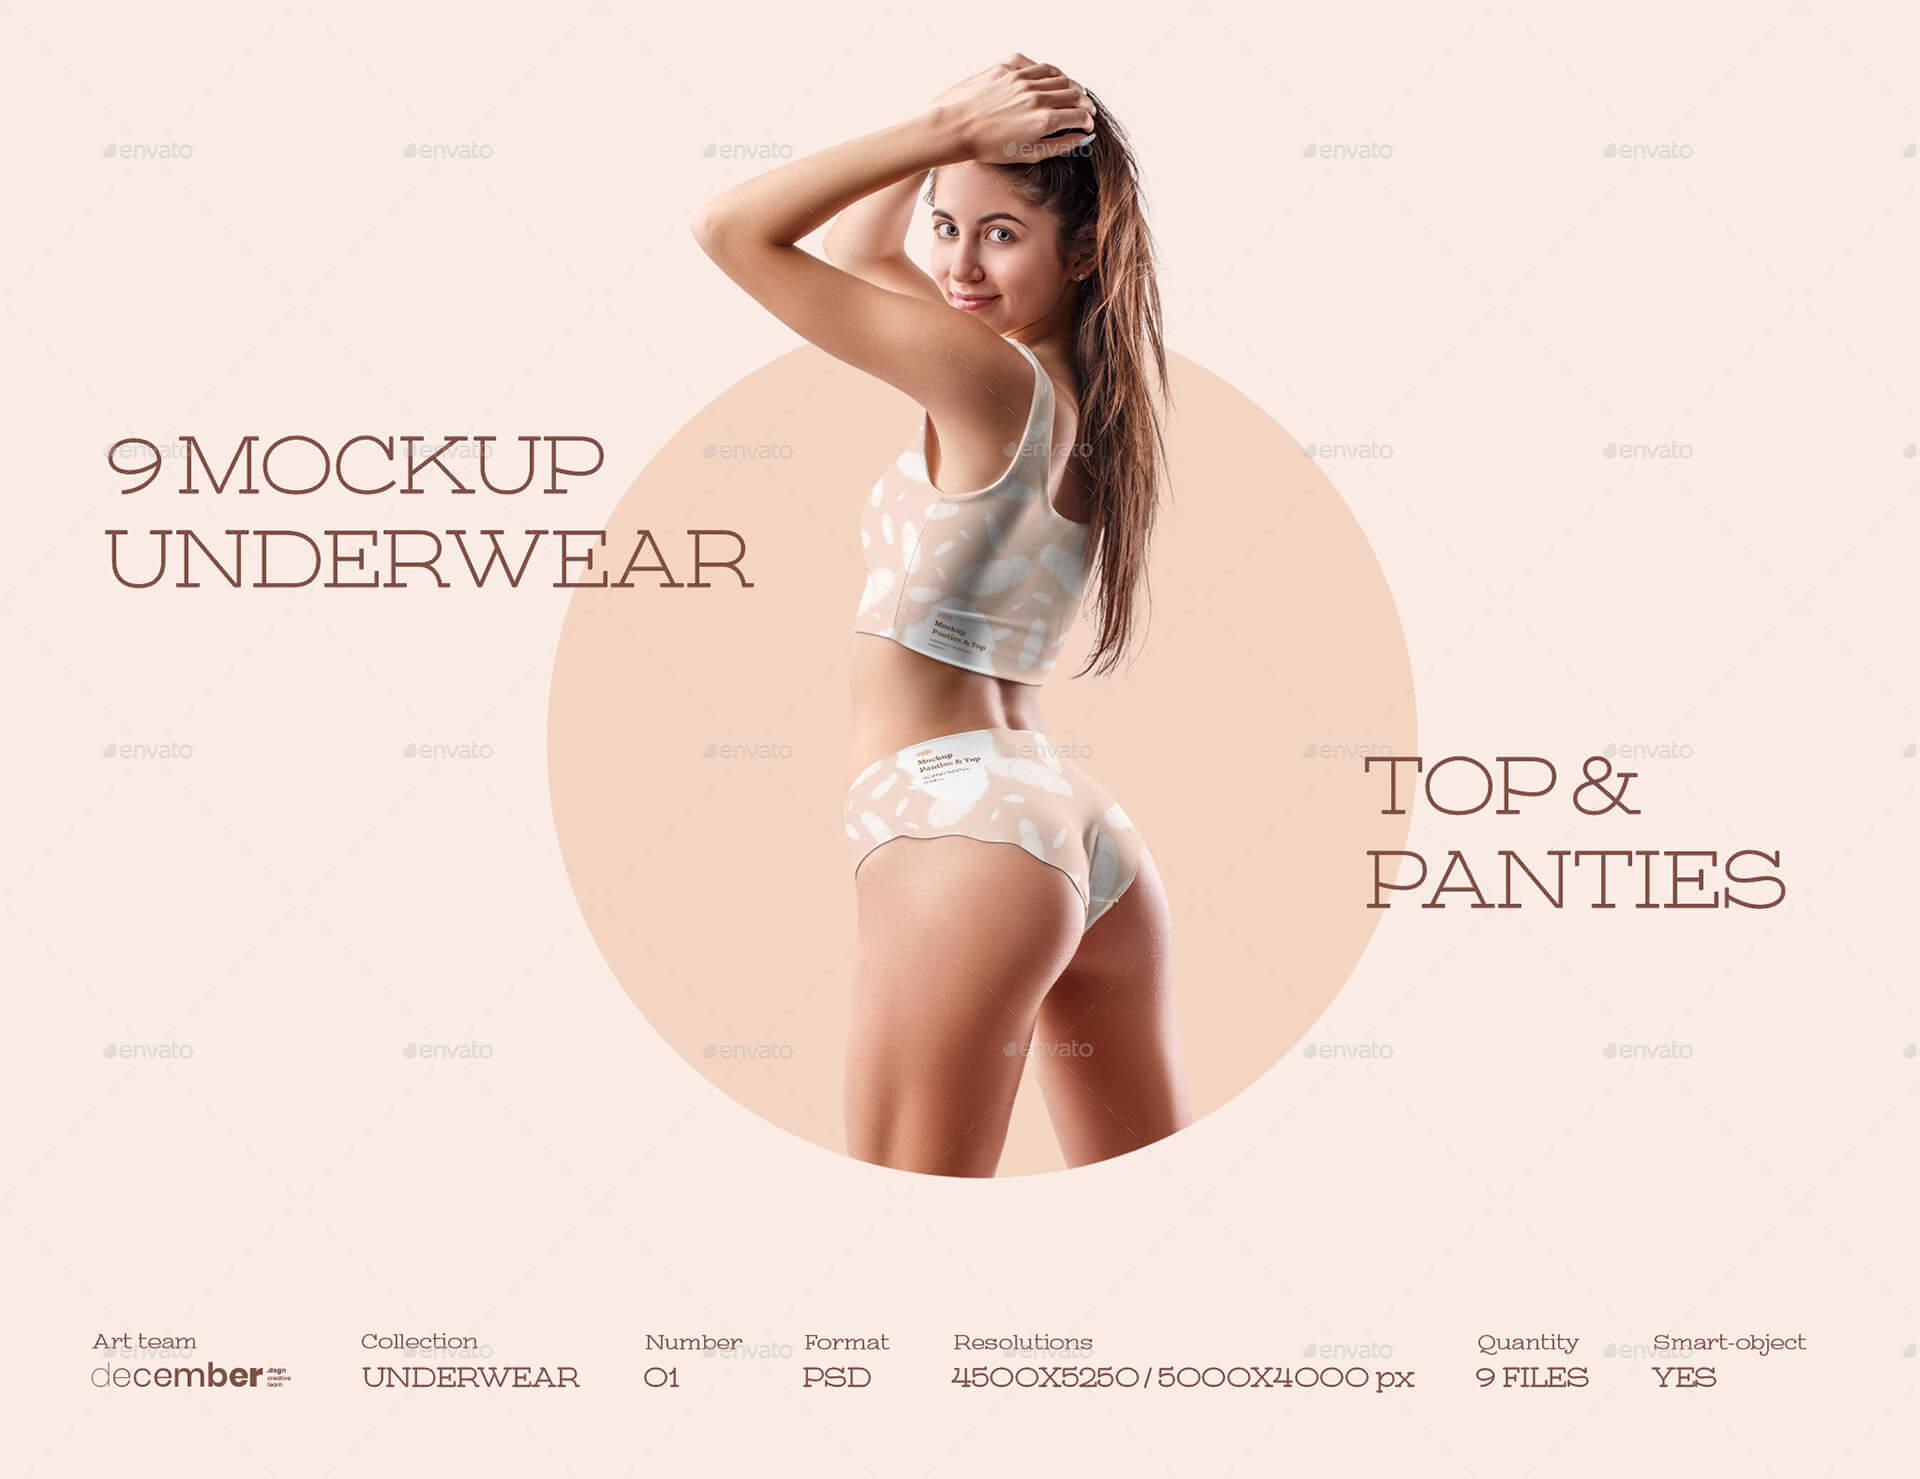 9 Mockups Woman Underwear. Top and Panties (1)